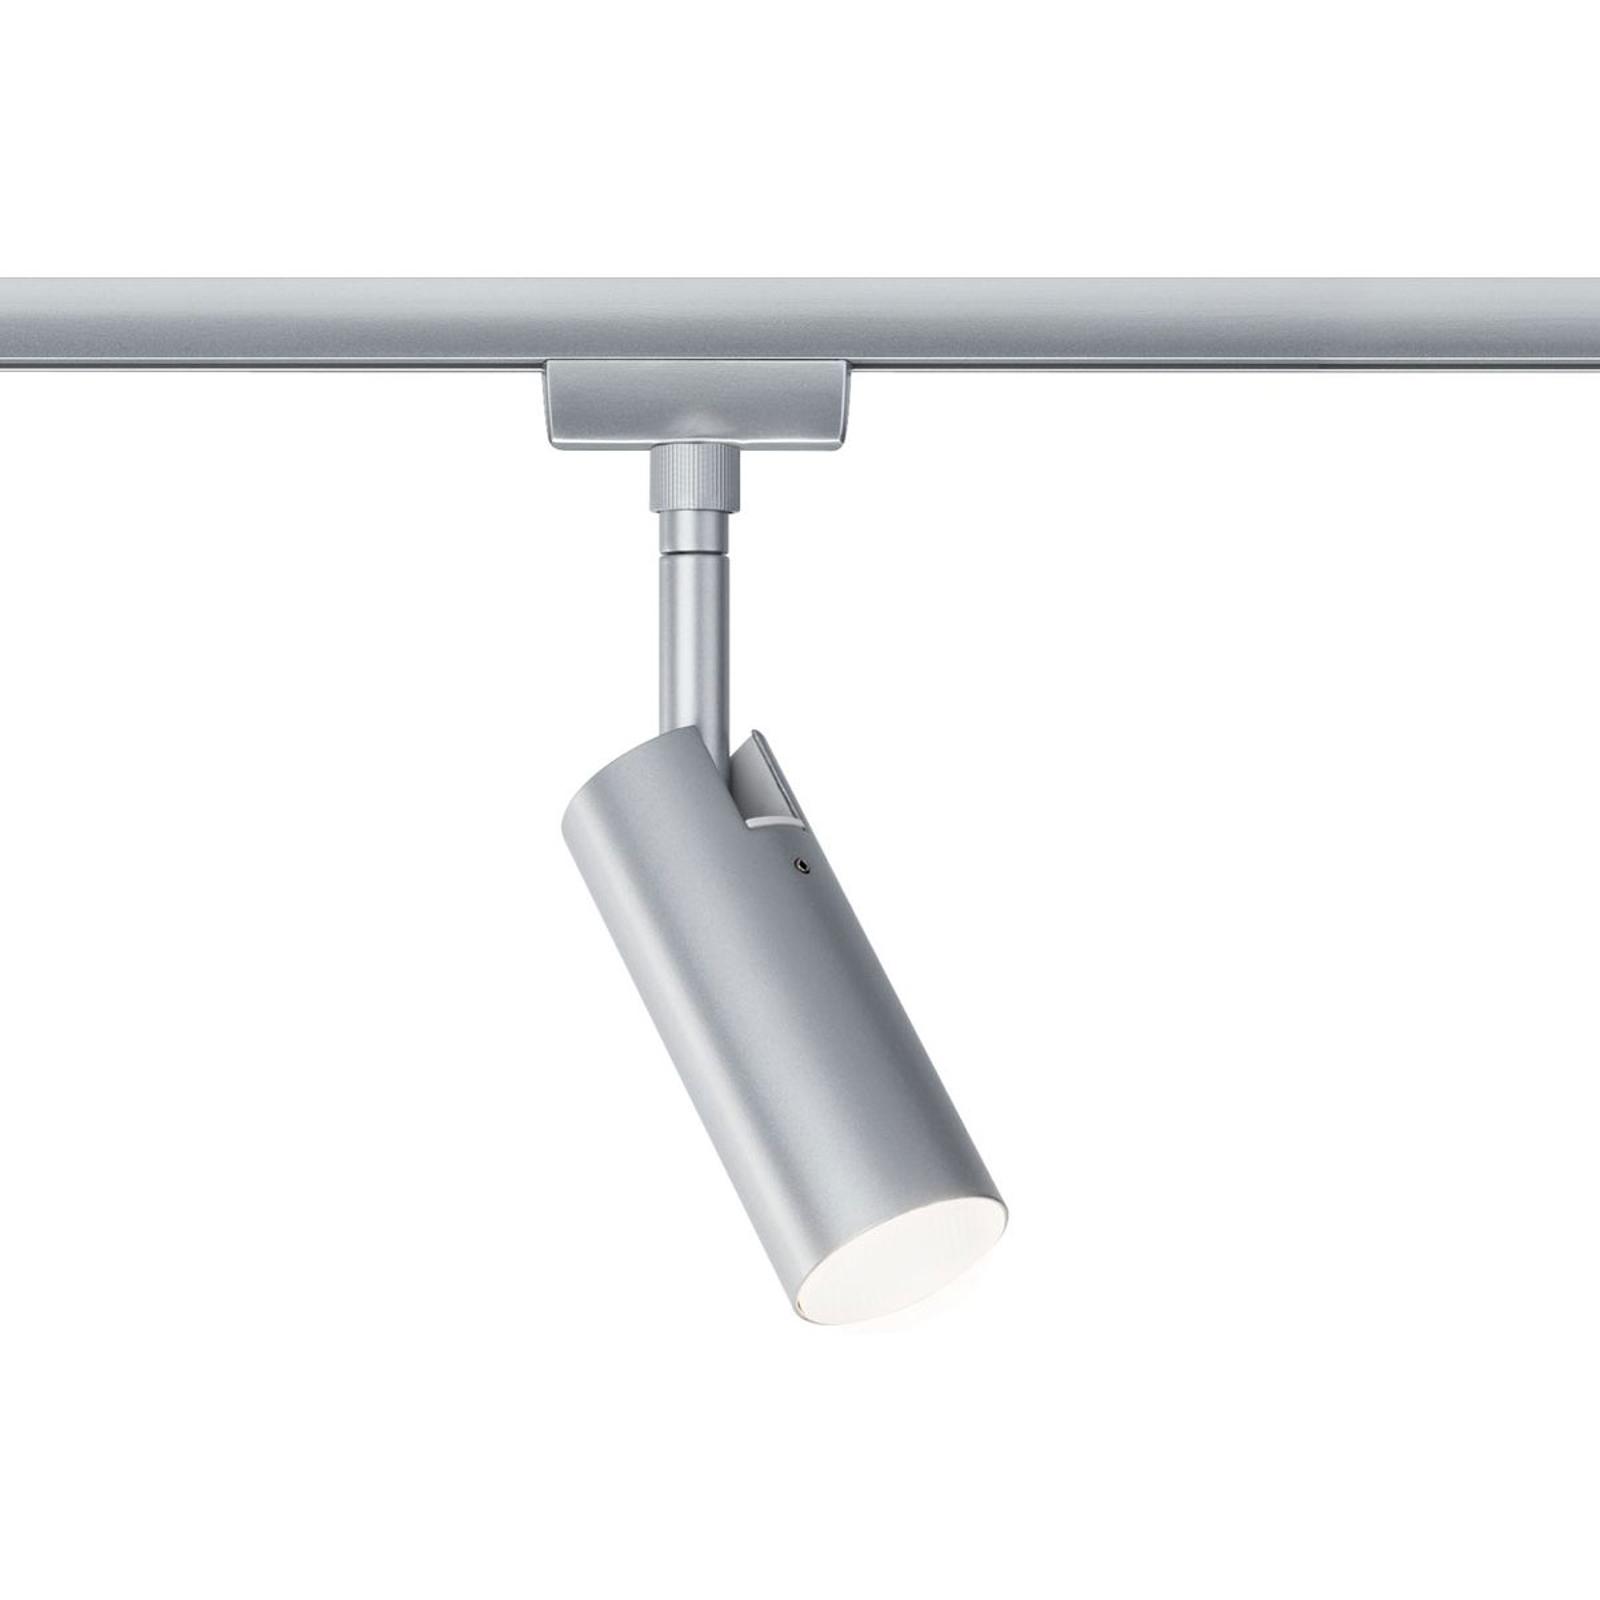 Paulmann URail Tubo faretto LED, cromato opaco